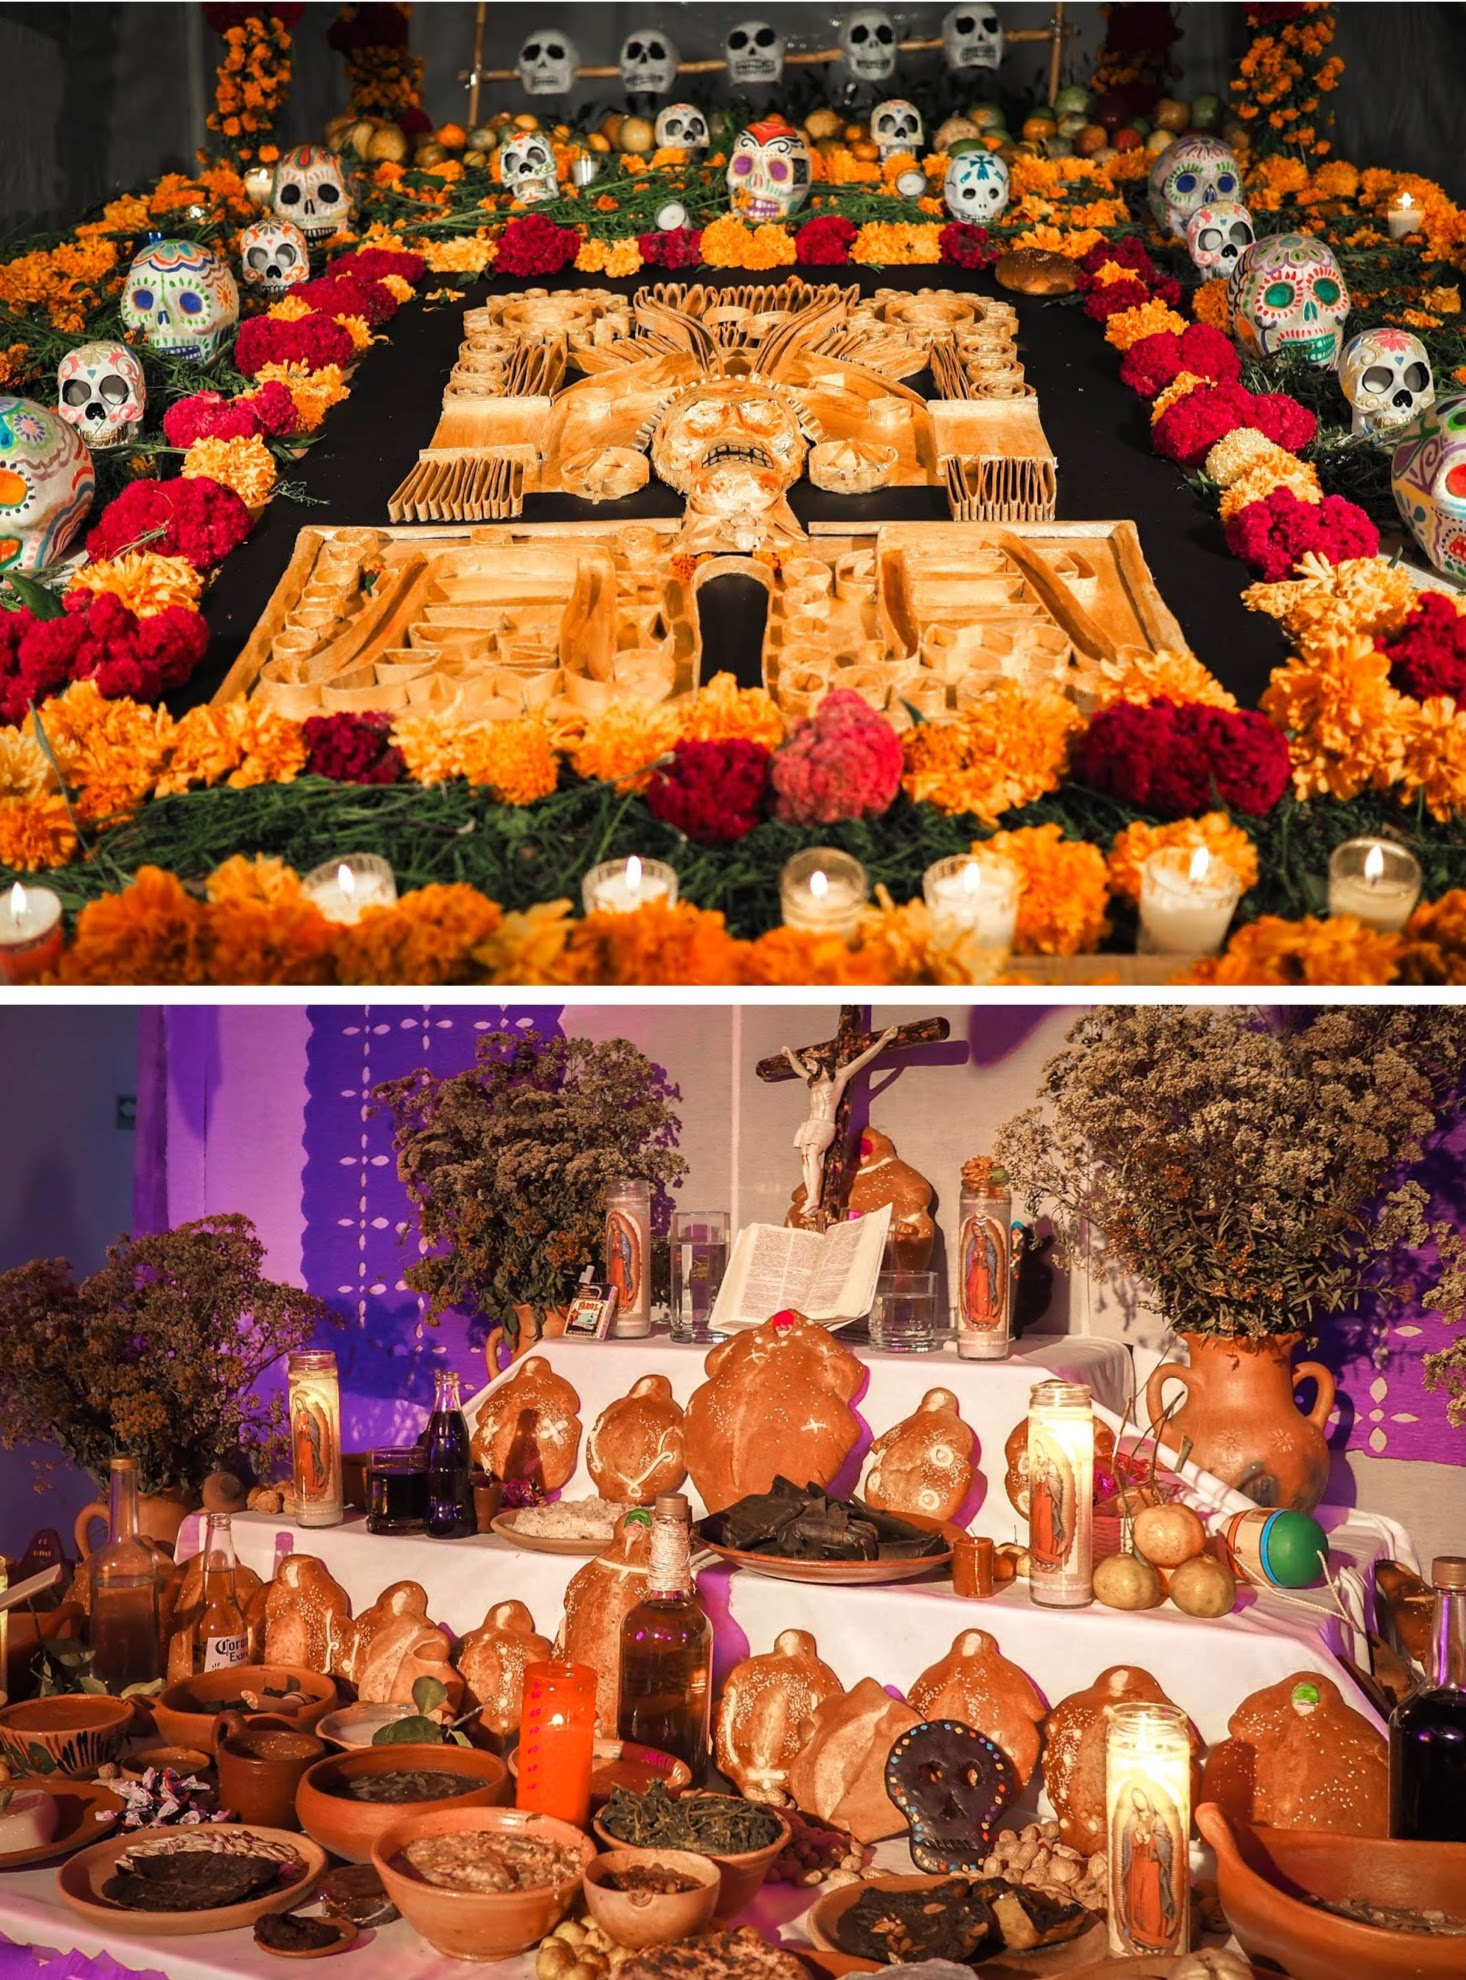 You'll see a lot of ofrendas in Oaxaca during Dia de Los Muertos